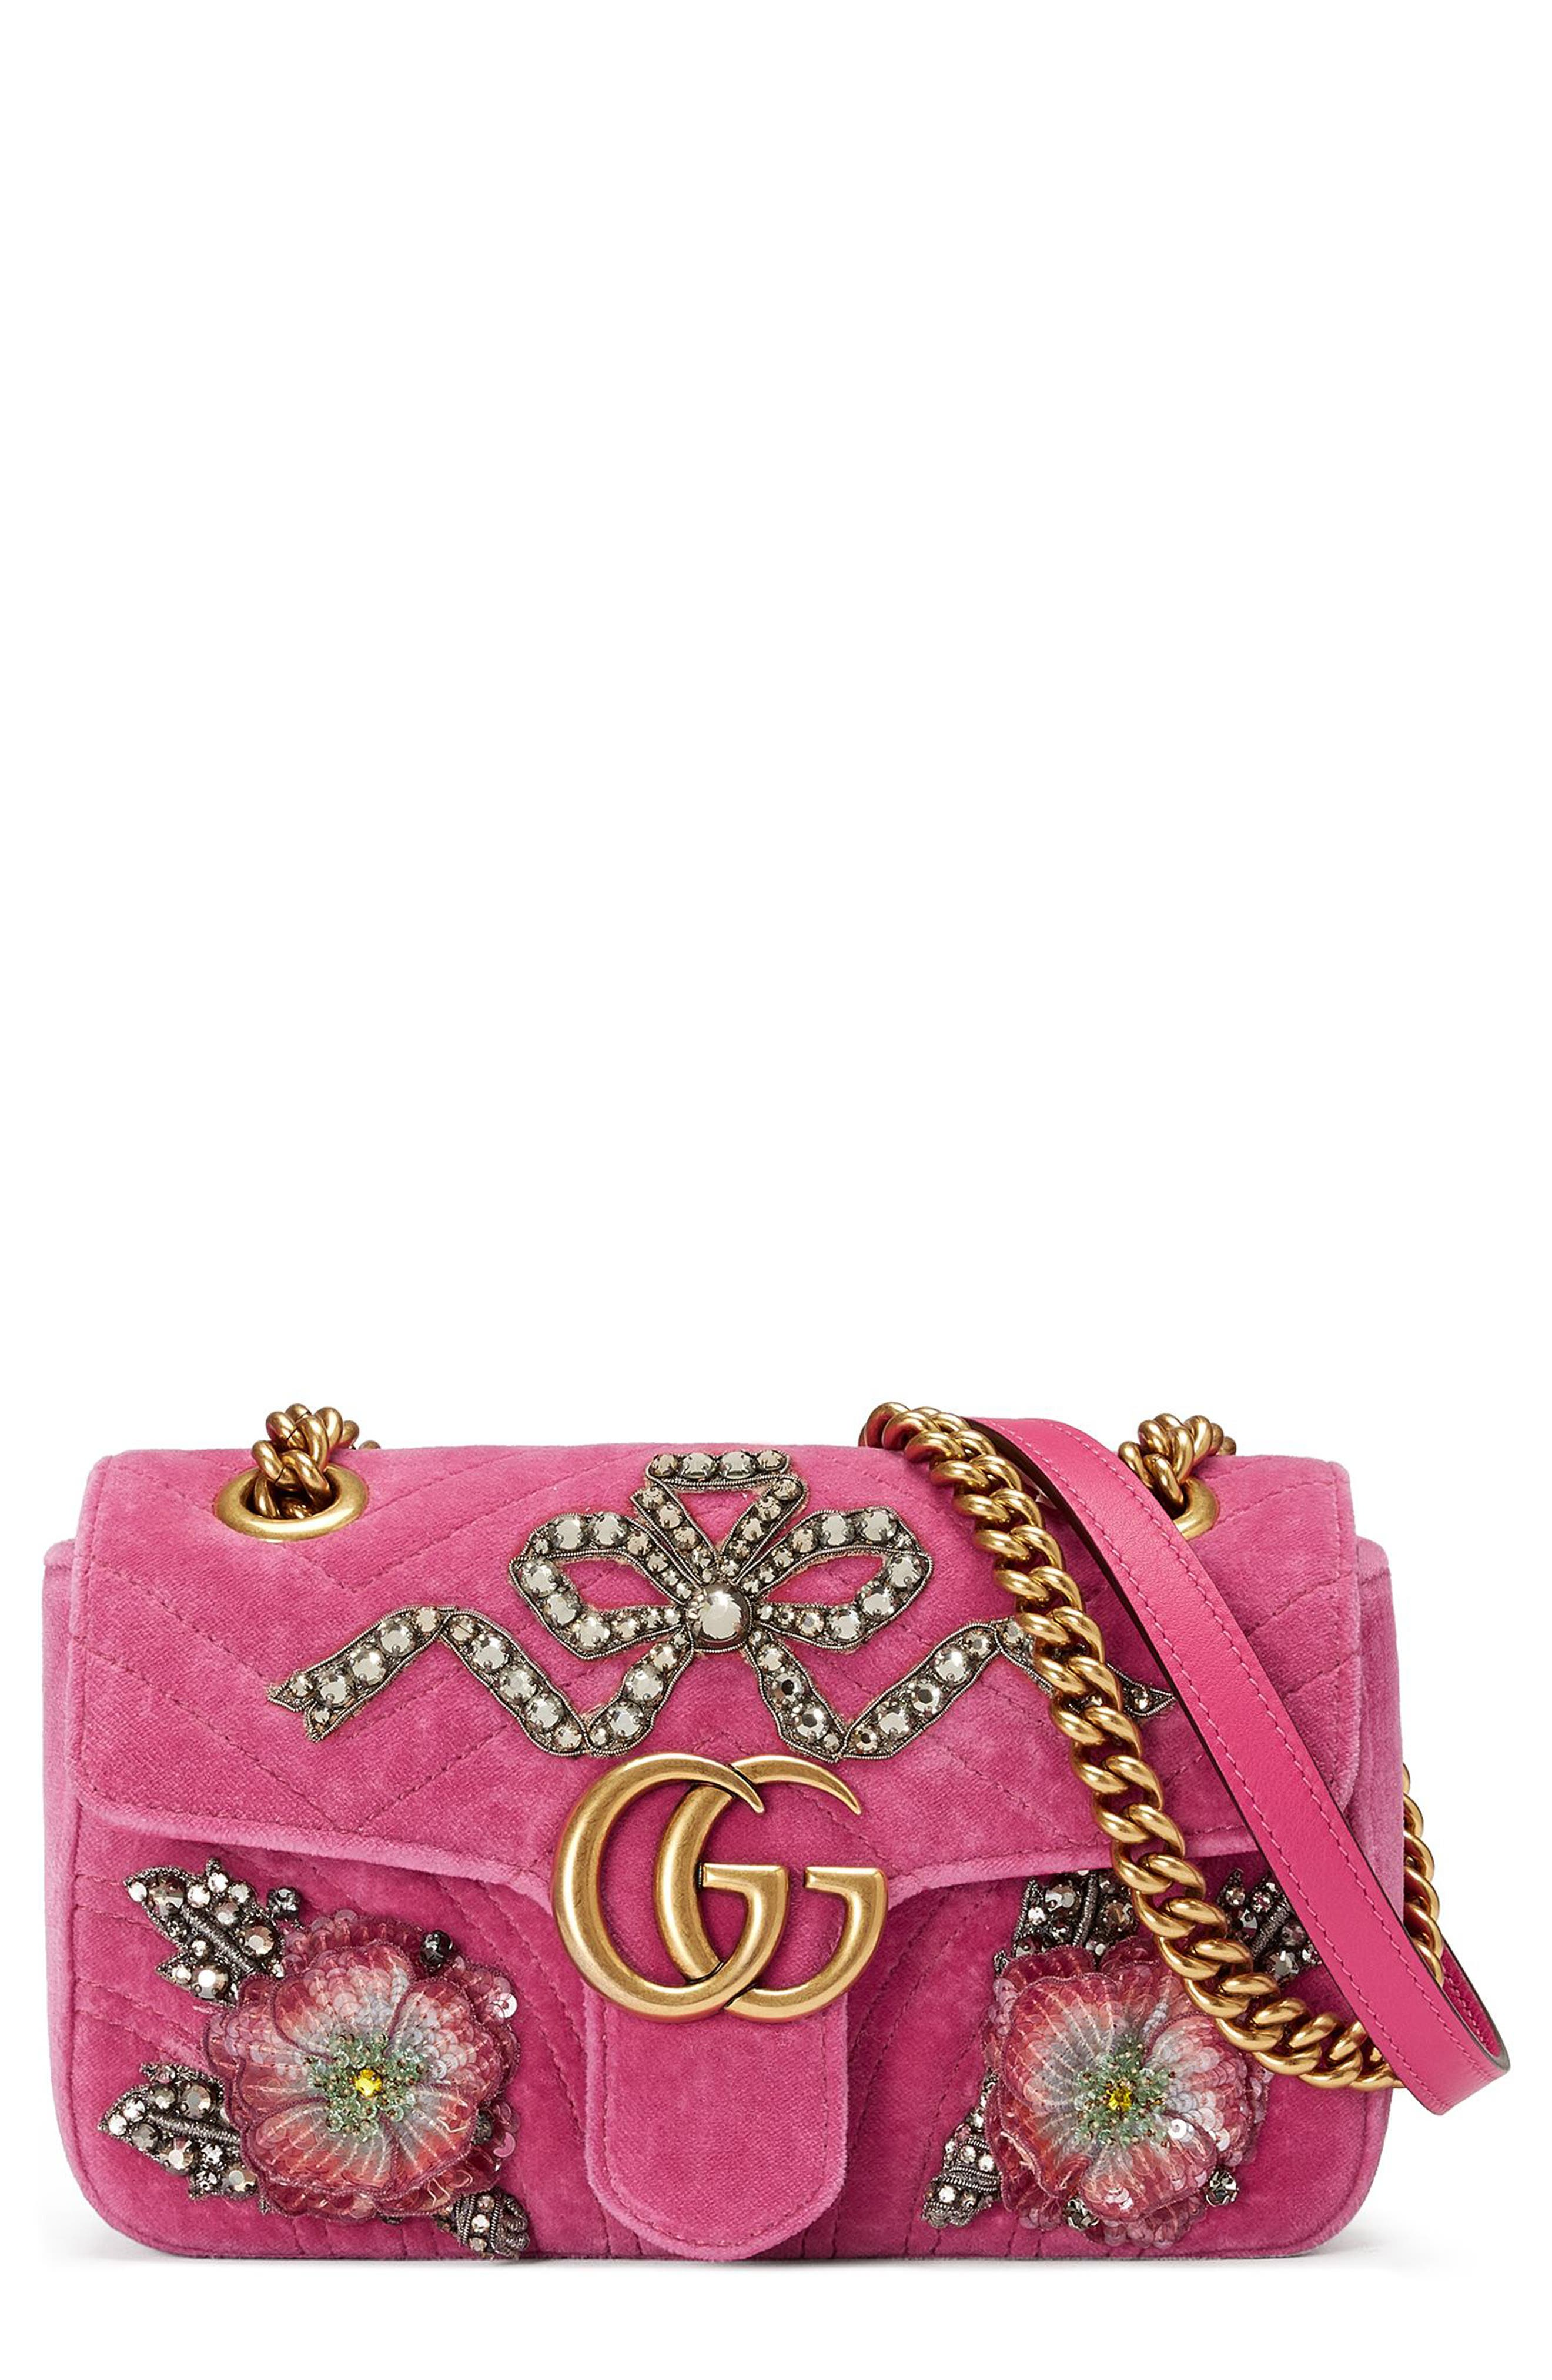 Mini GG Marmont Matelassé Velvet Shoulder Bag,                         Main,                         color, Raspberry